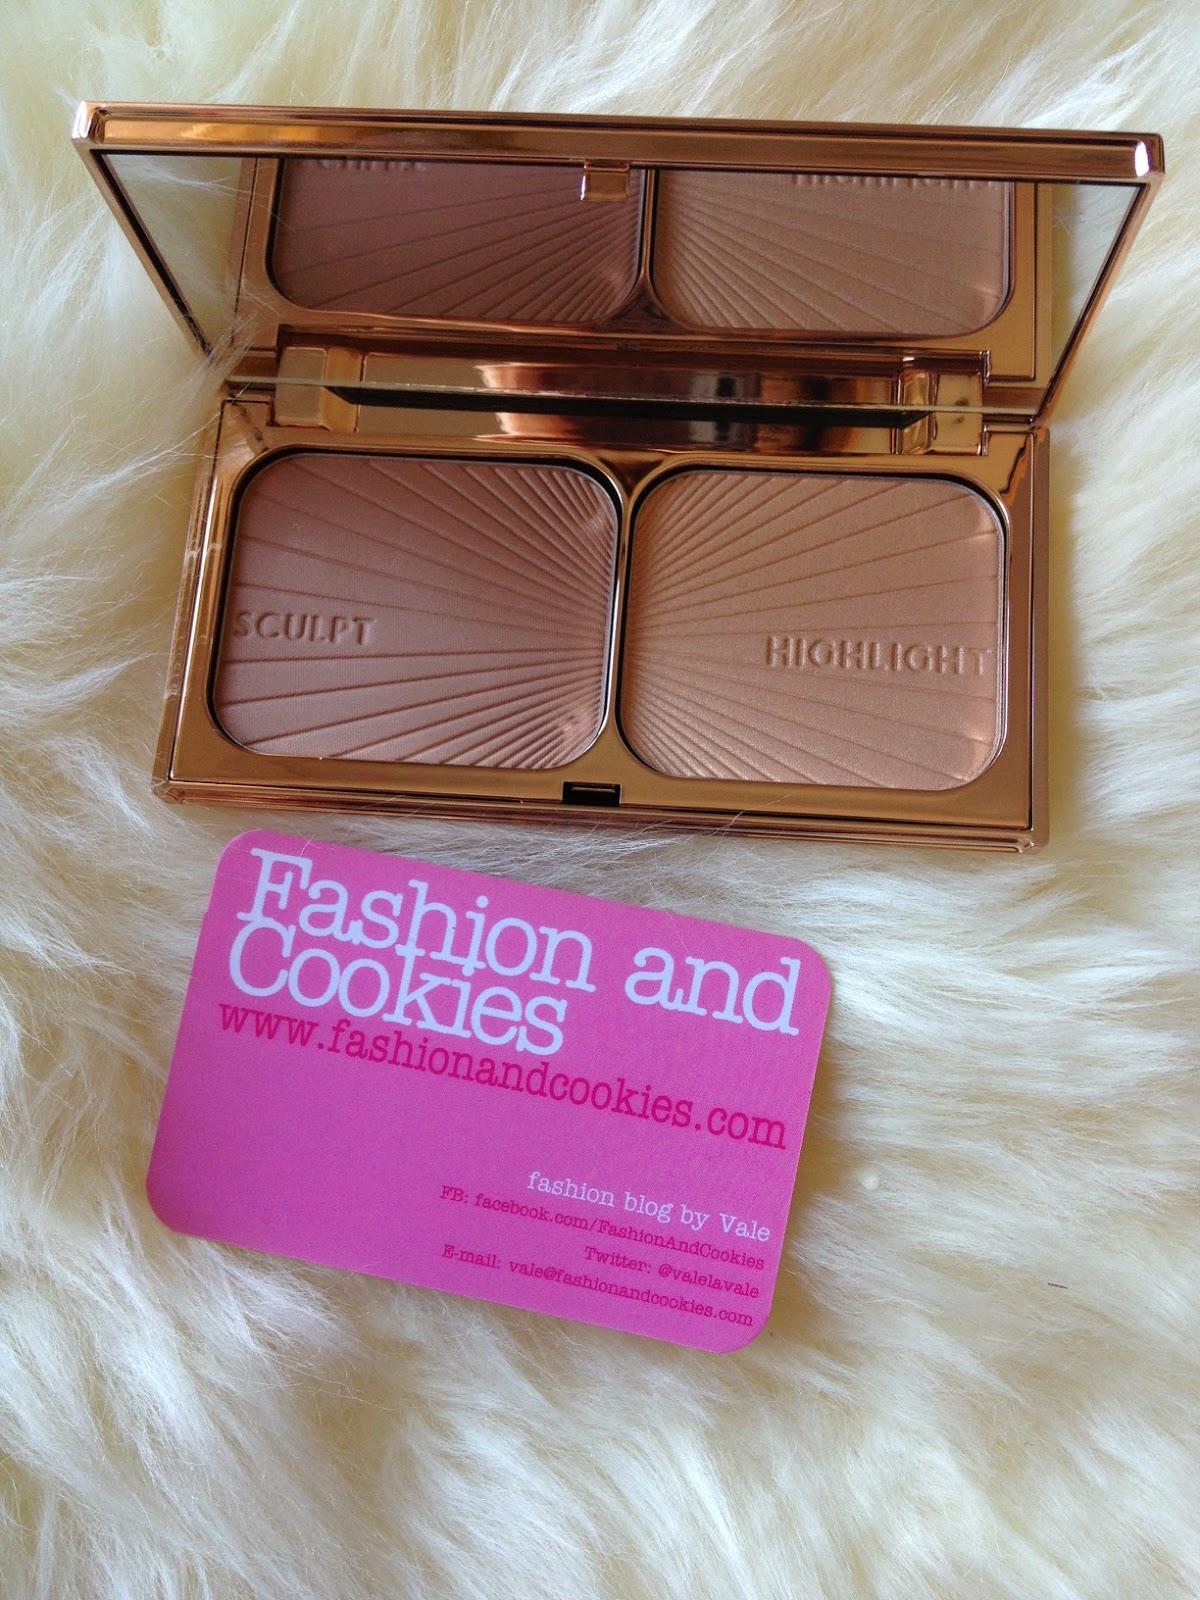 Charlotte Tilbury Filmstar Bronze & Glow review, recensione bronzer e illuminante su Fashion and Cookies fashion blog